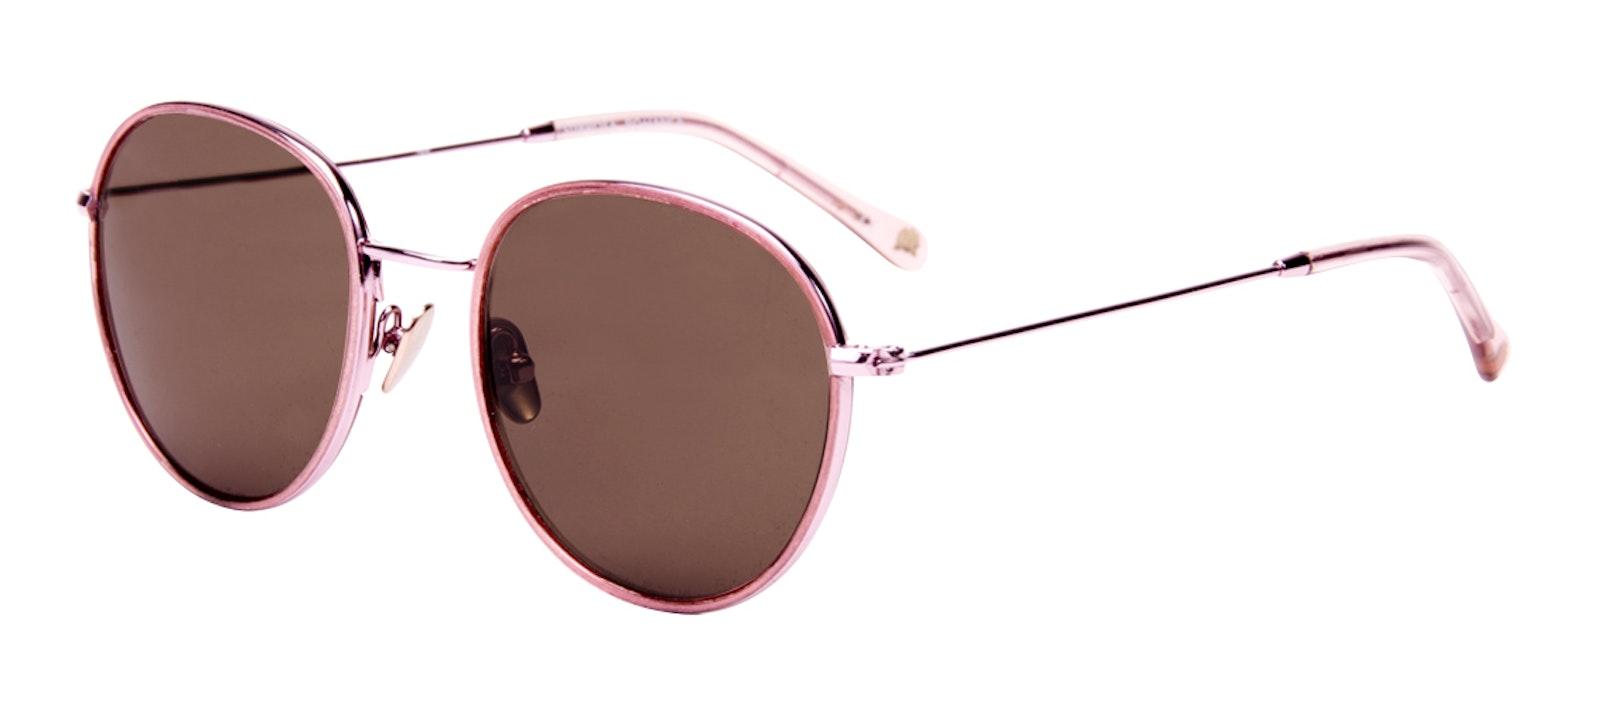 Affordable Fashion Glasses Aviator Round Sunglasses Women Subrosa Romance Tilt